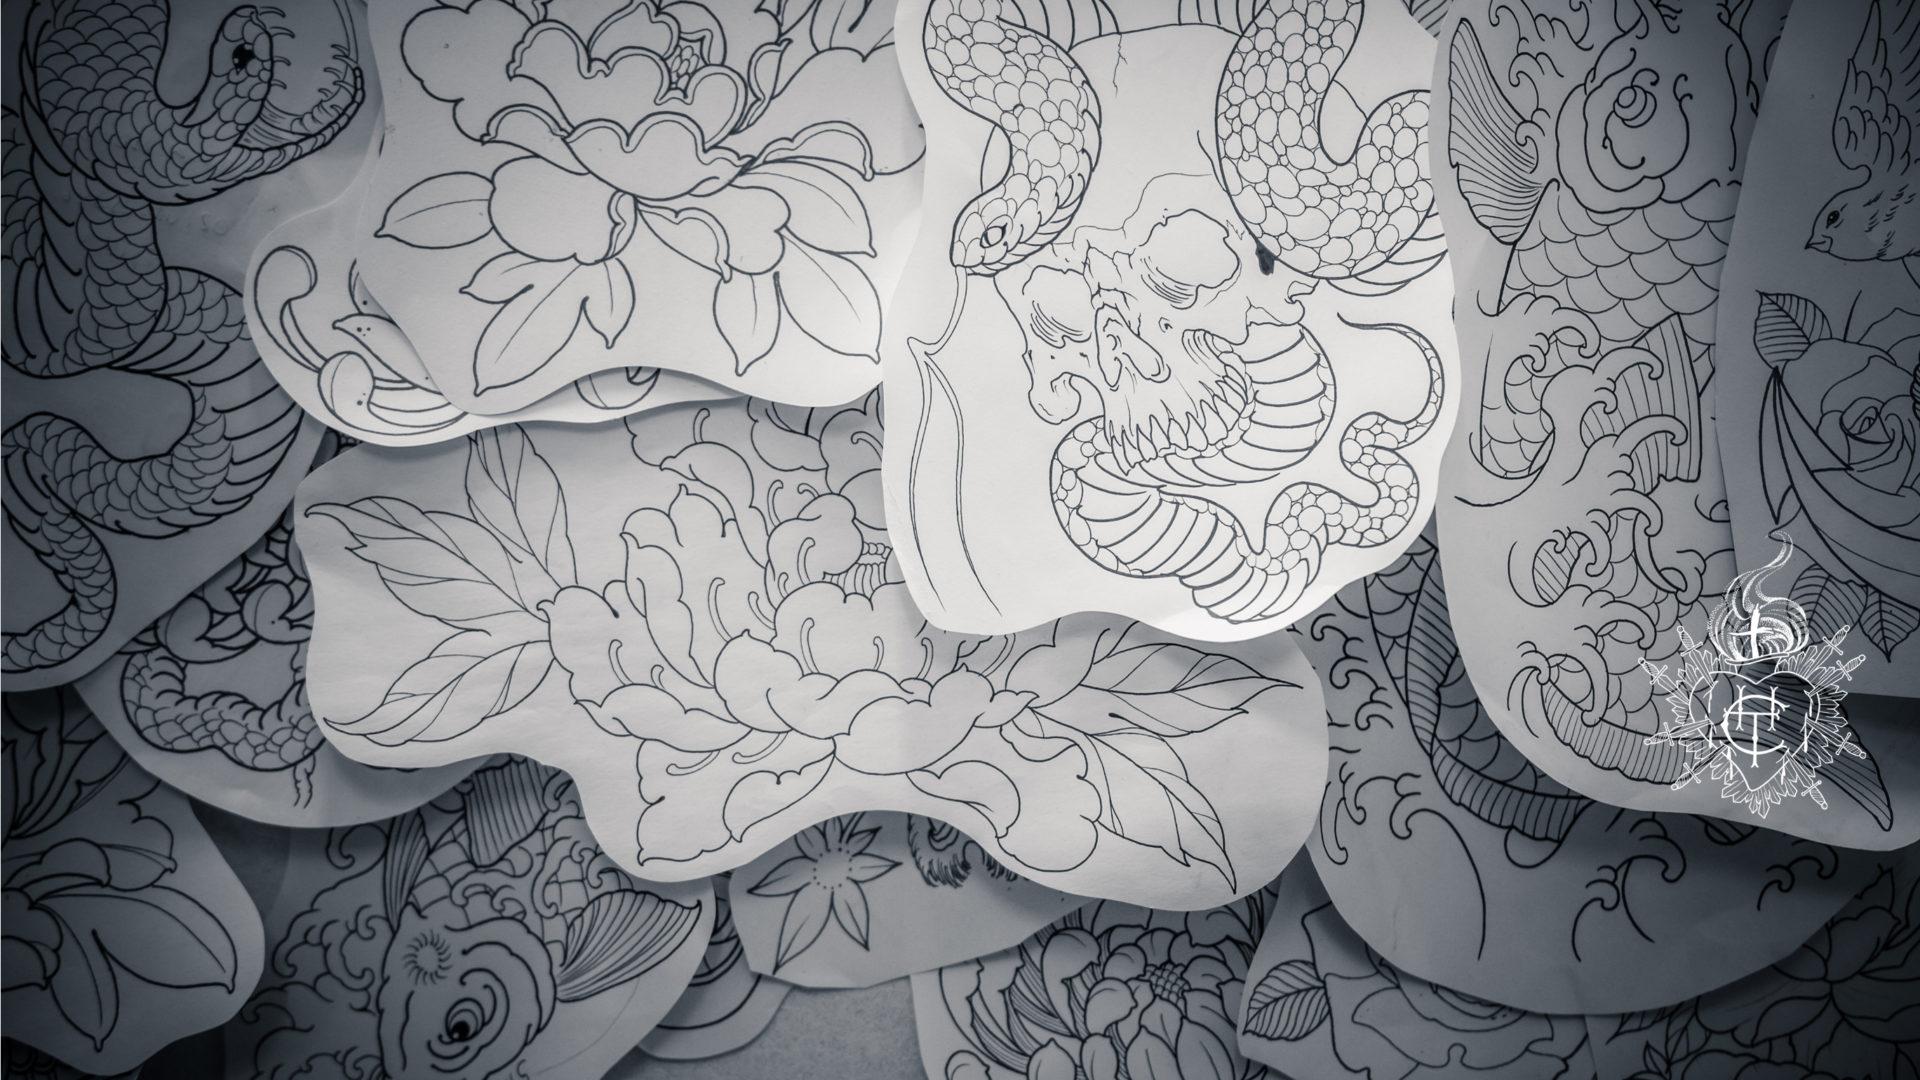 Tattoo designs Auckland